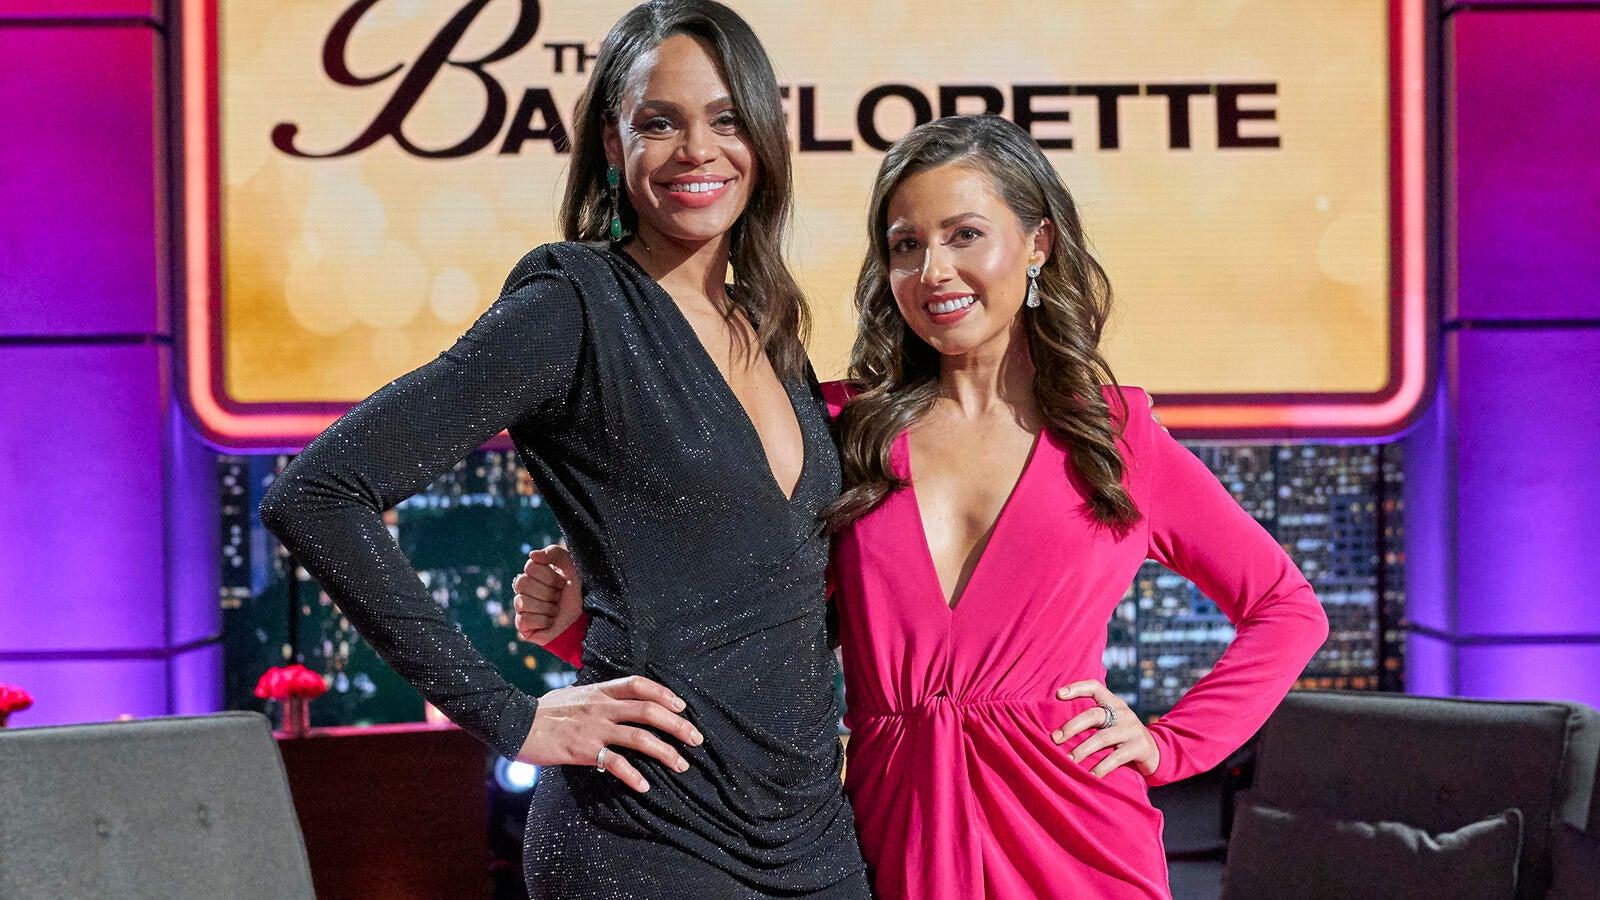 Michelle and Katie, The Bachelorette